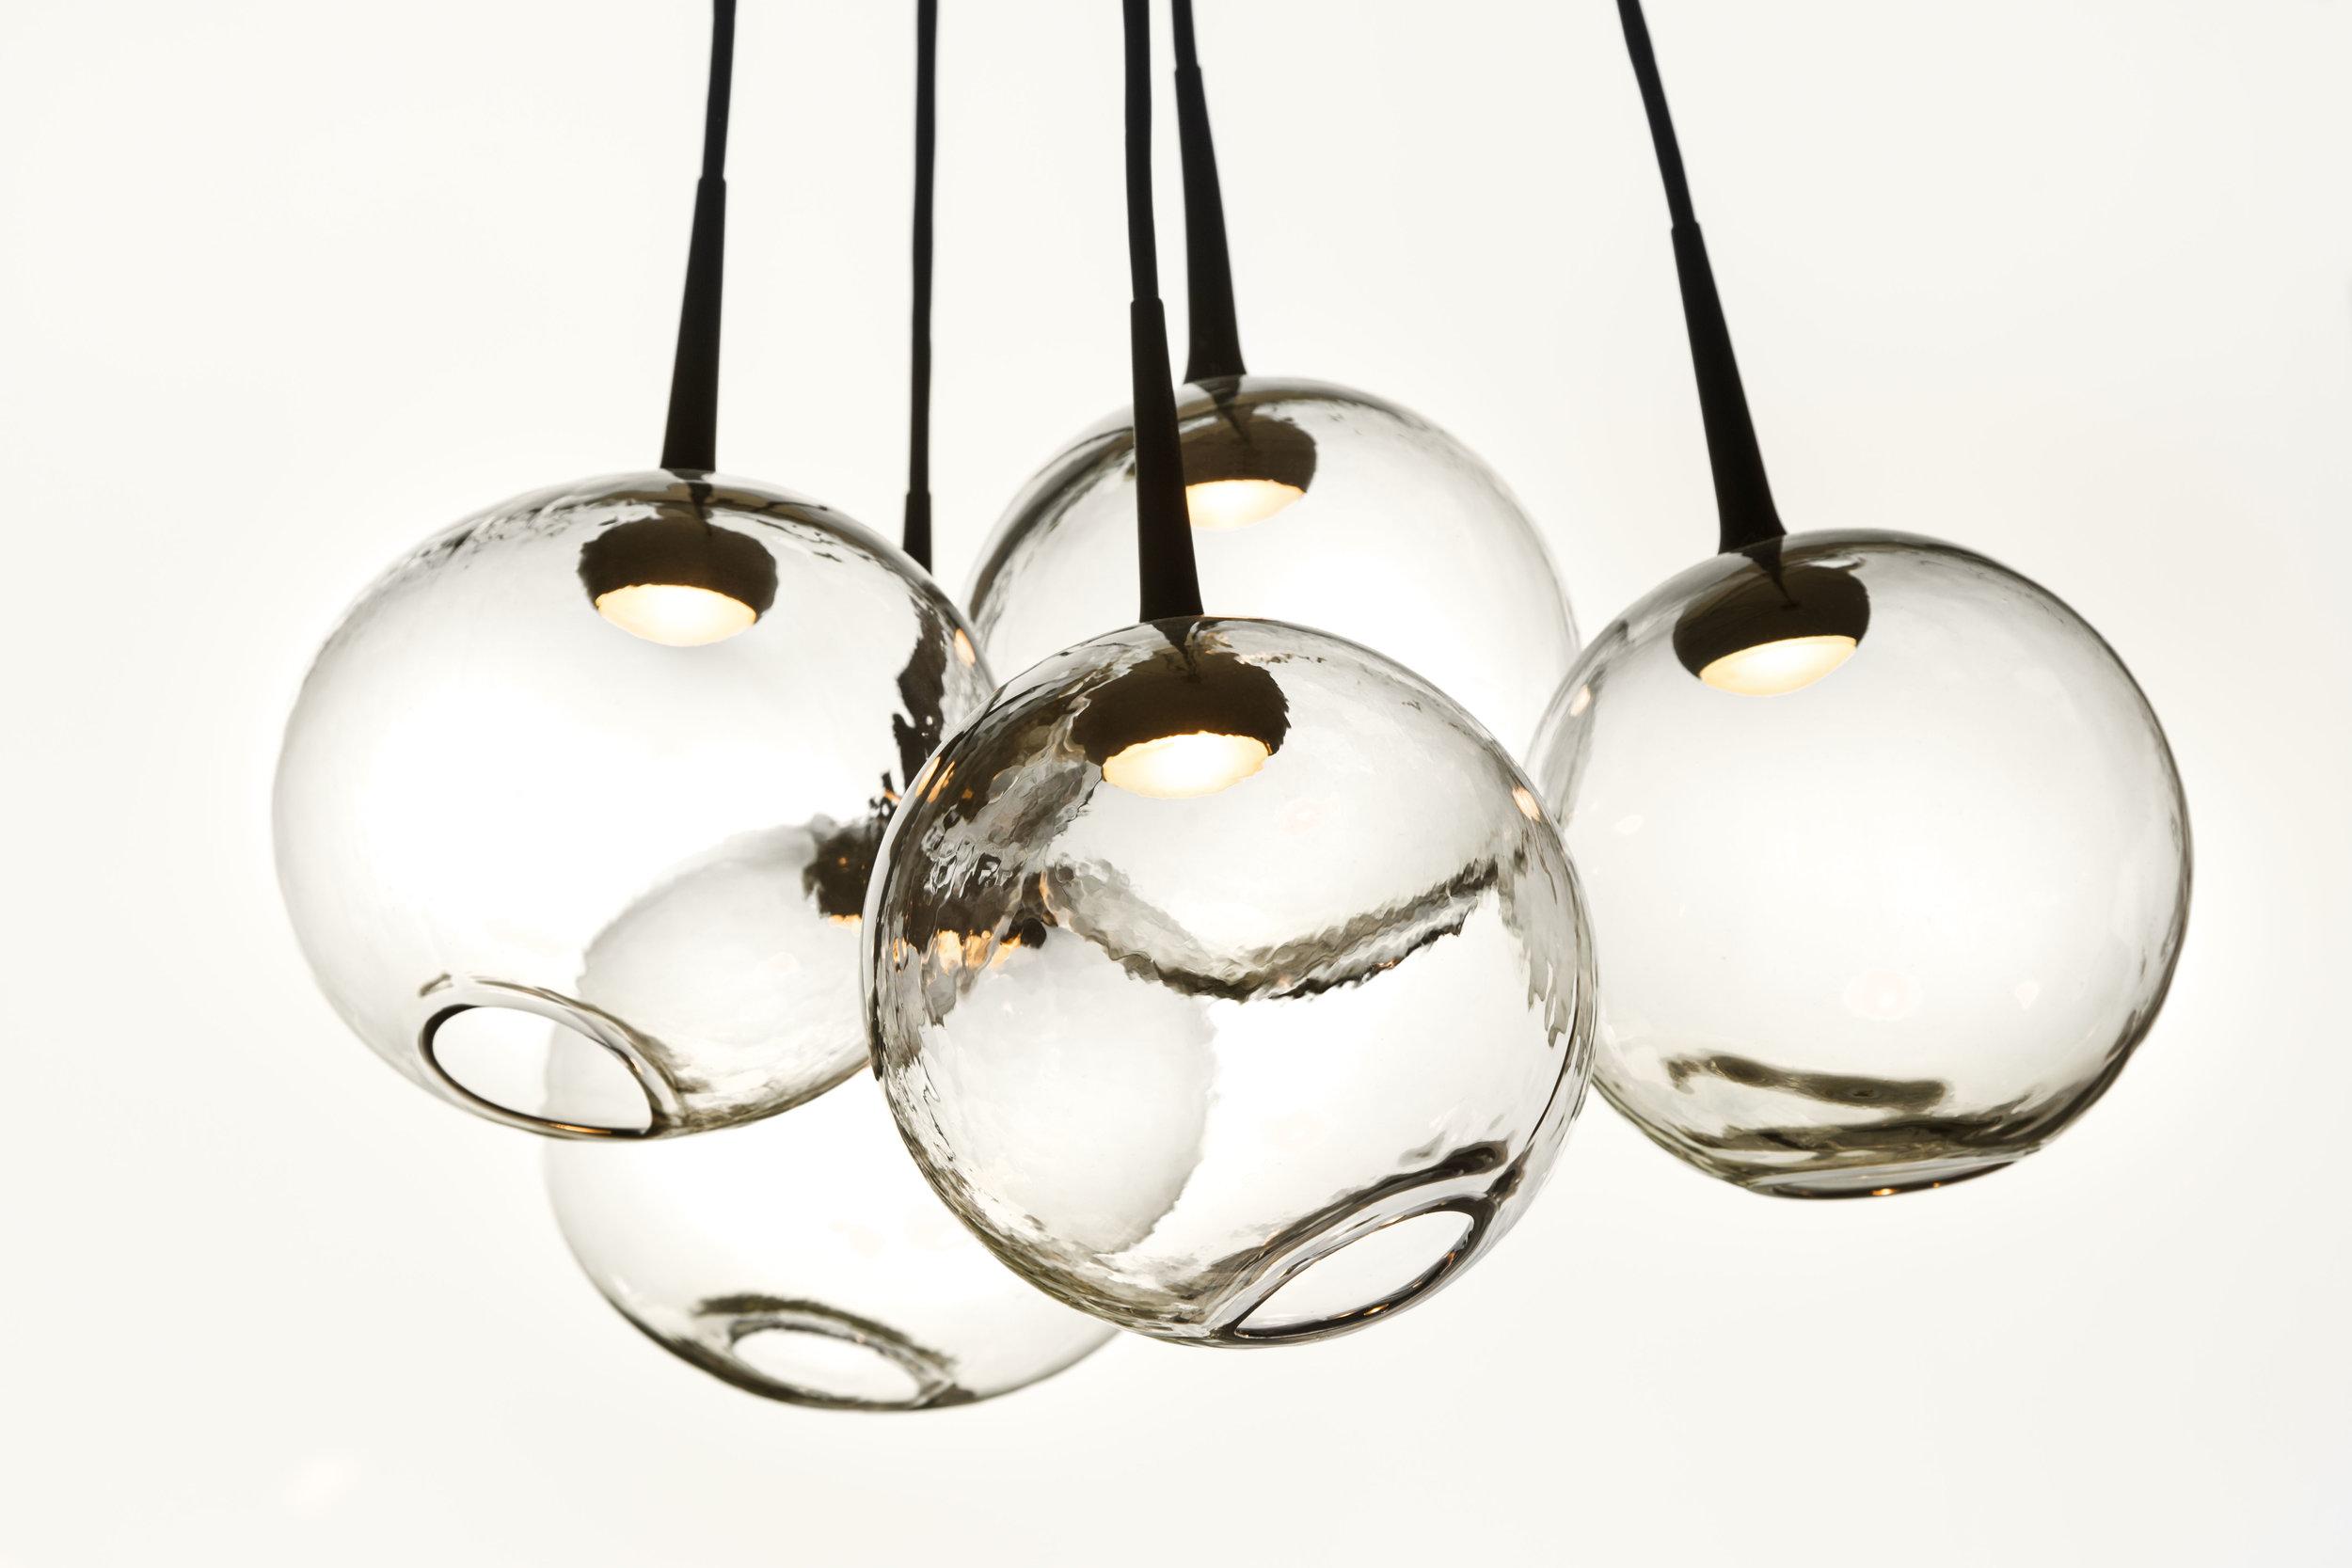 bubbles-light_lighting-design_coordination-berlin_02.jpg